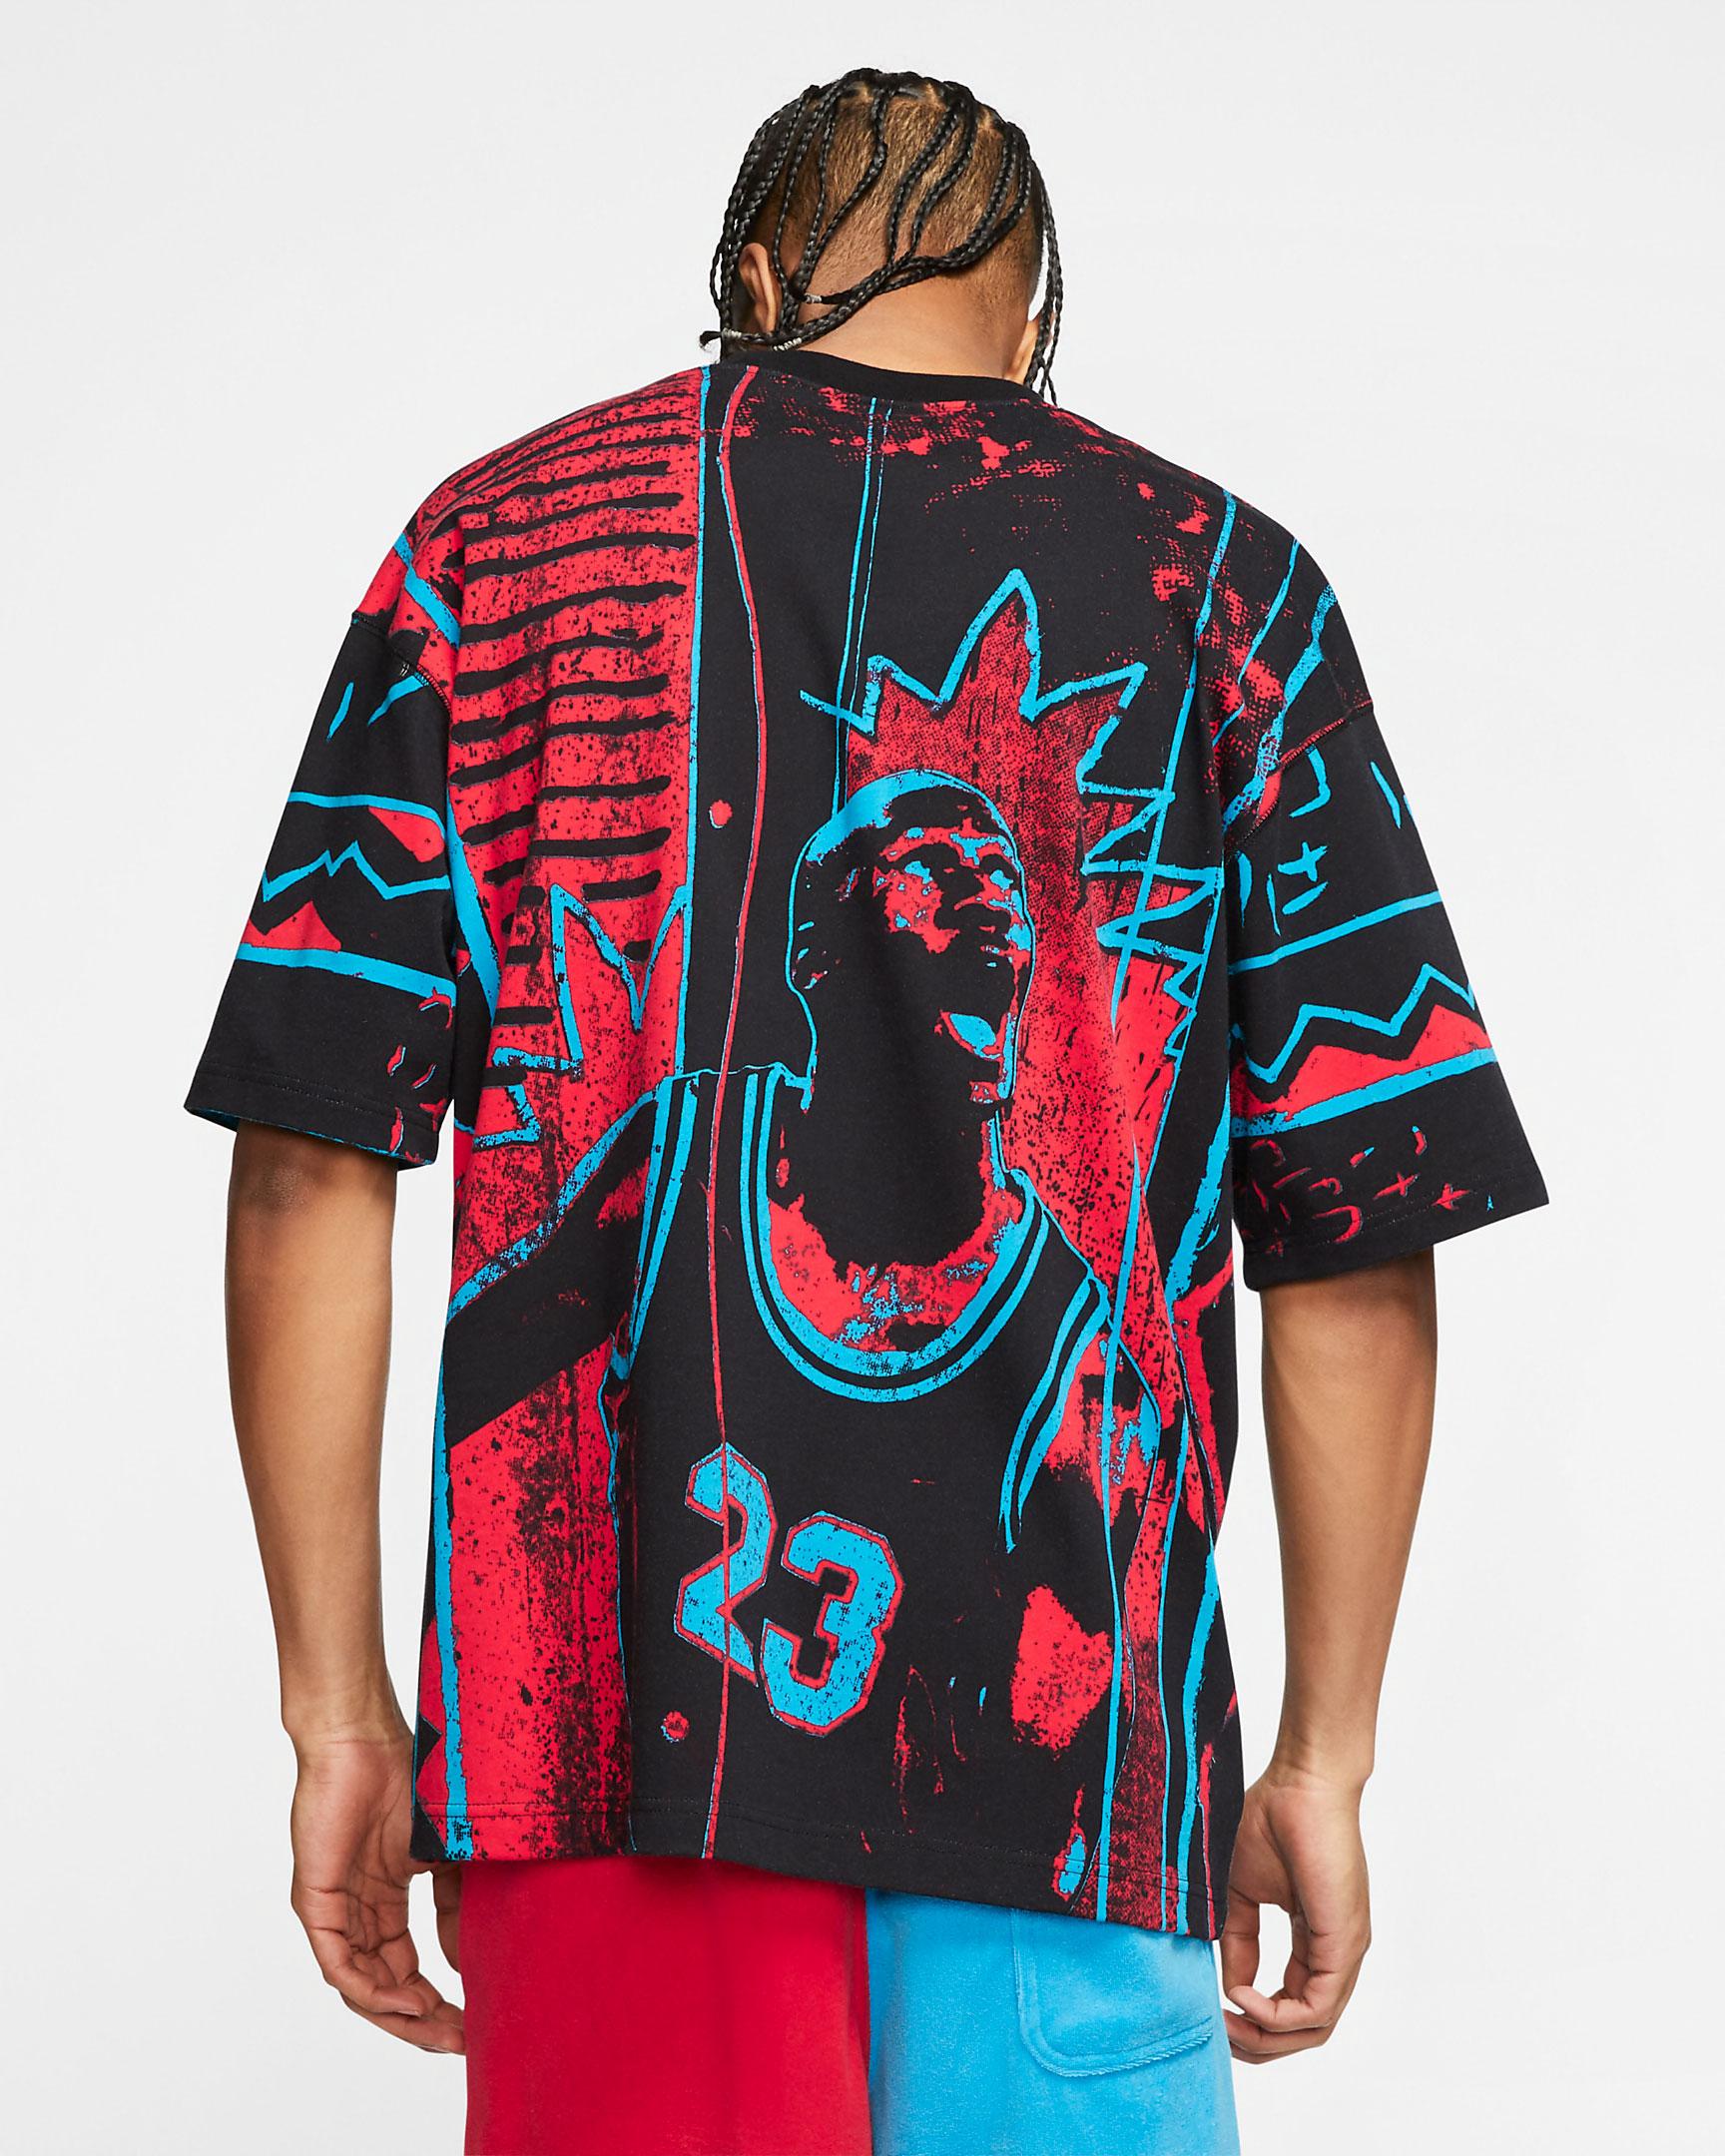 jordan-unc-to-chicago-shirt-2